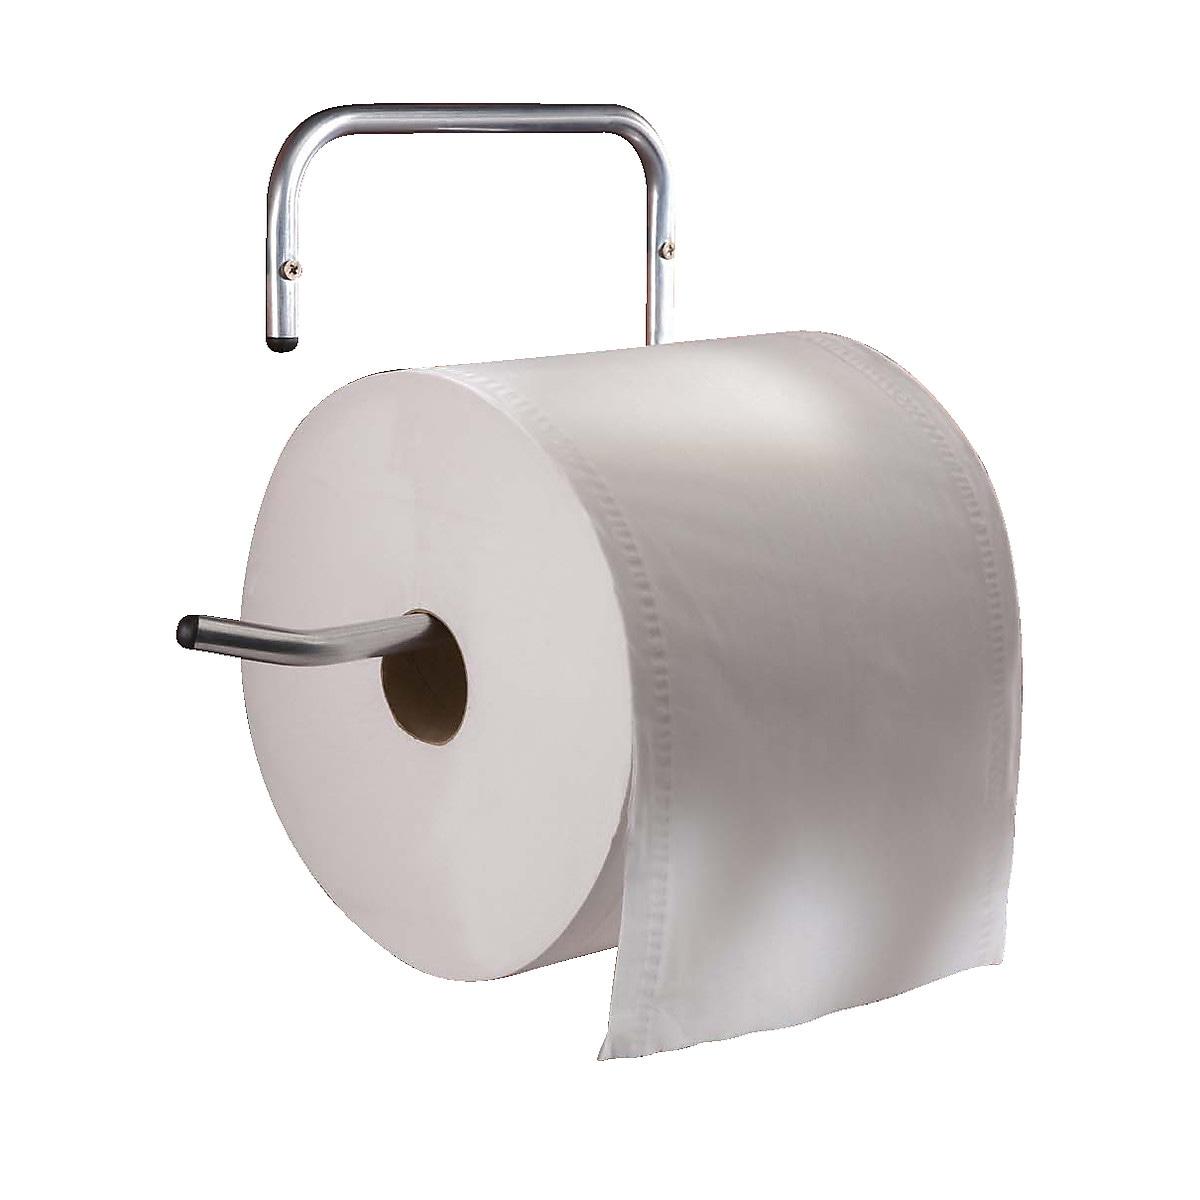 Pappershållare